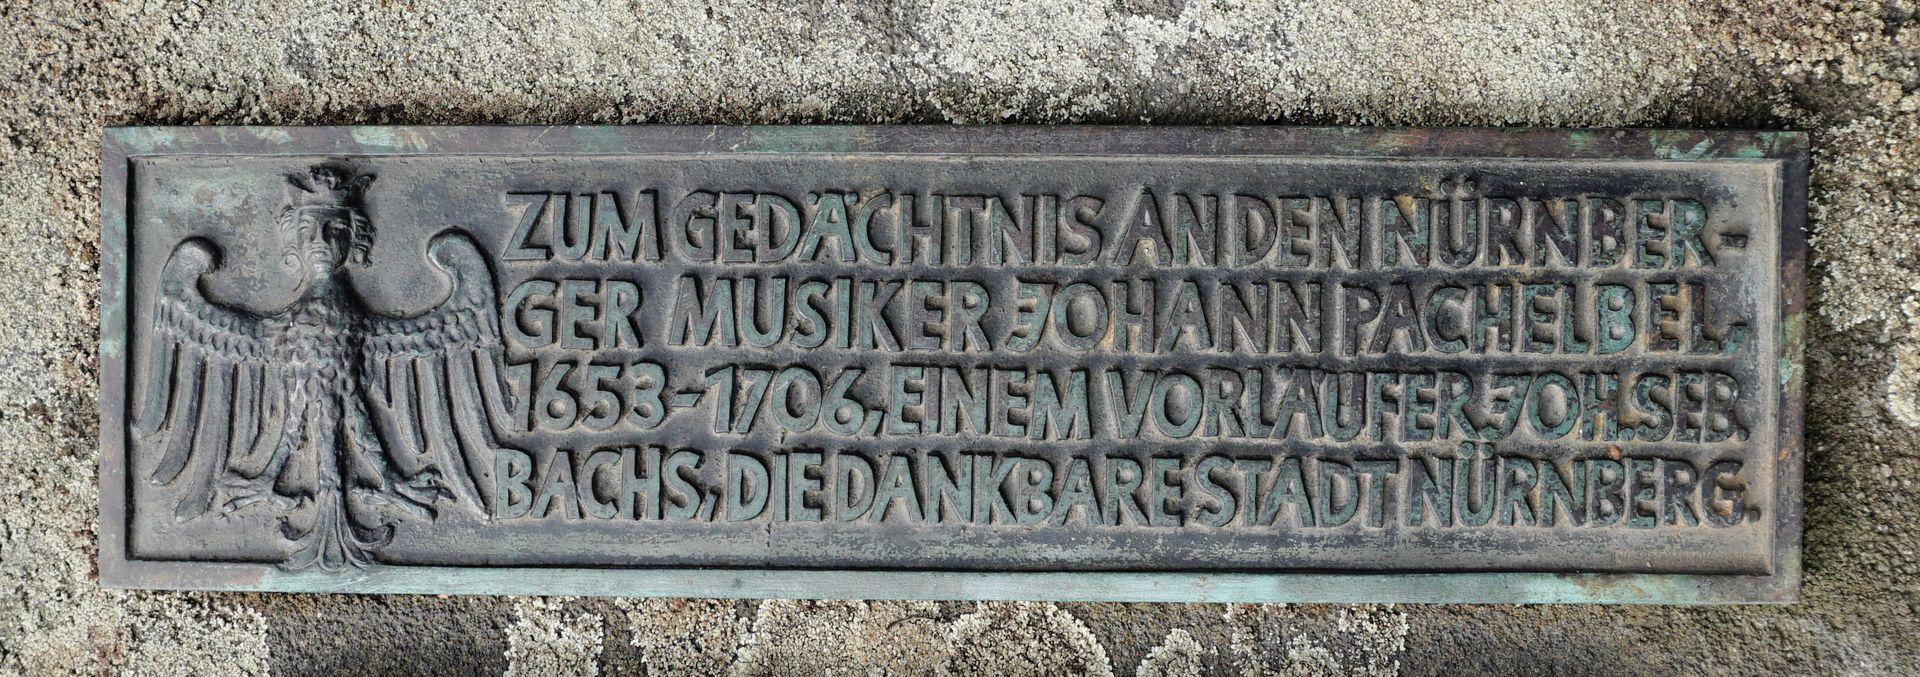 Johann Pachelbel Gravesite Commemorative plaque